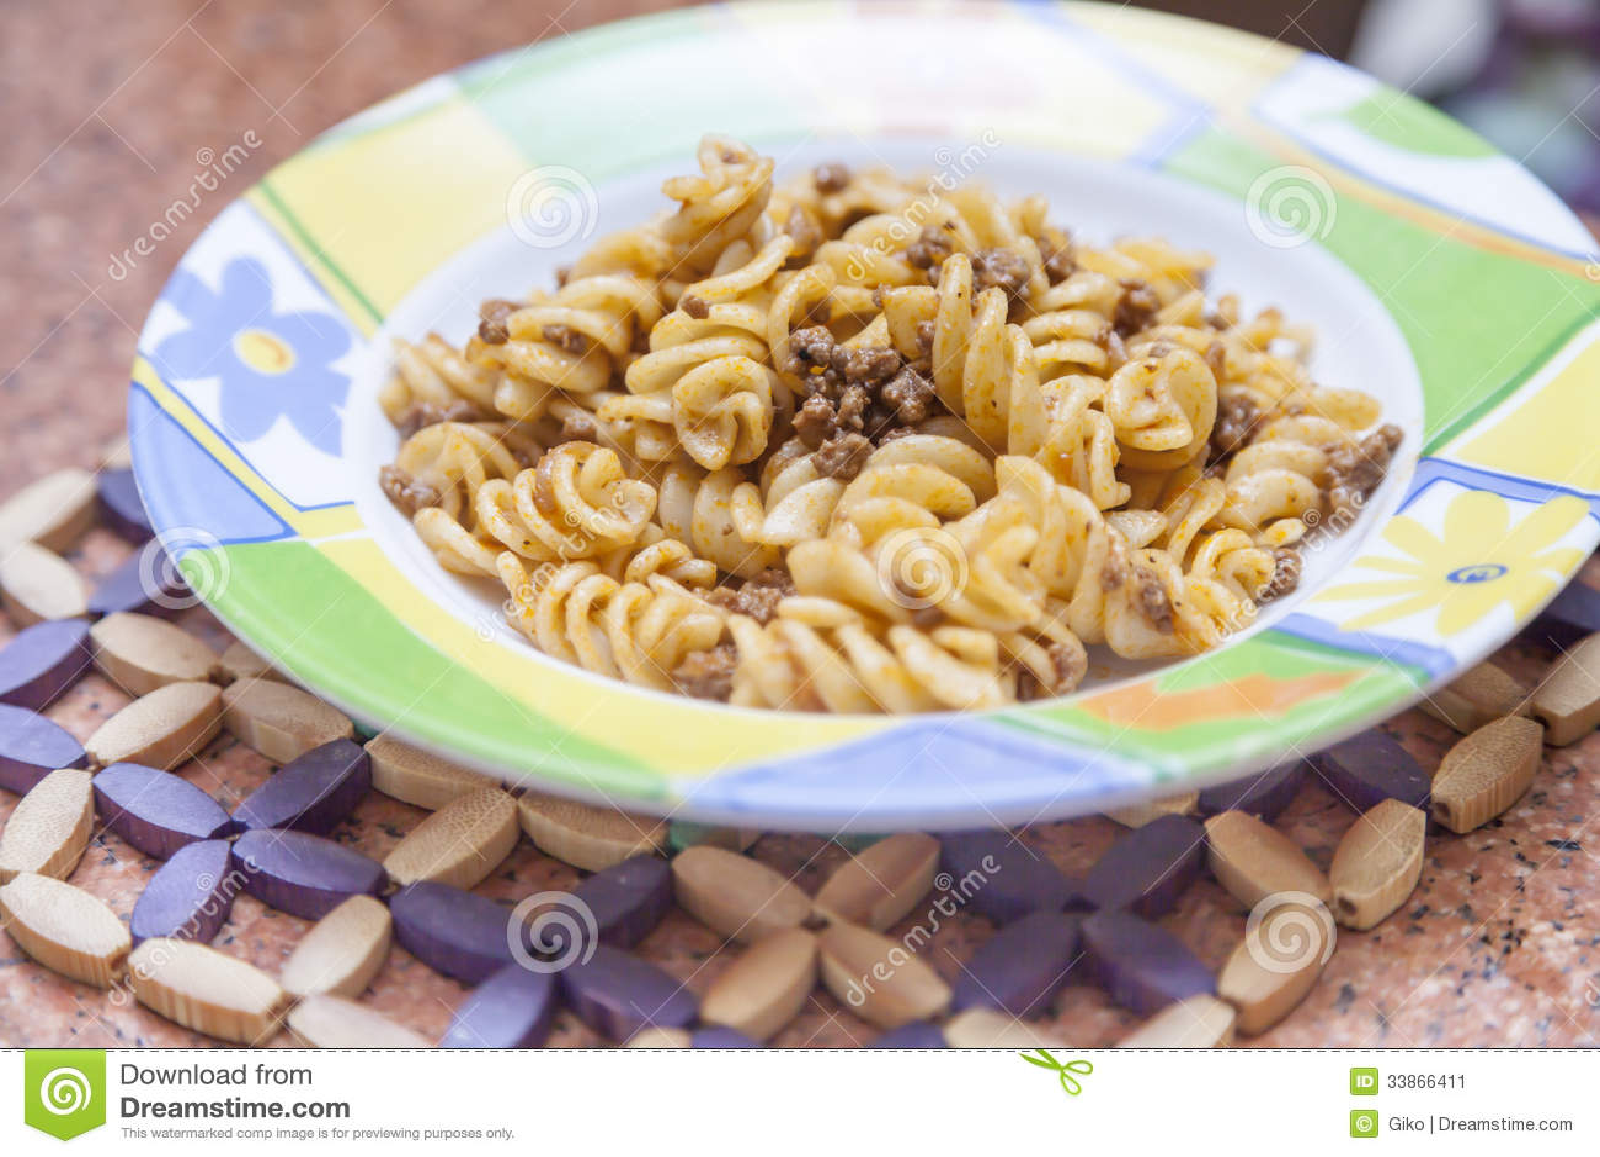 how to say tasty in italian